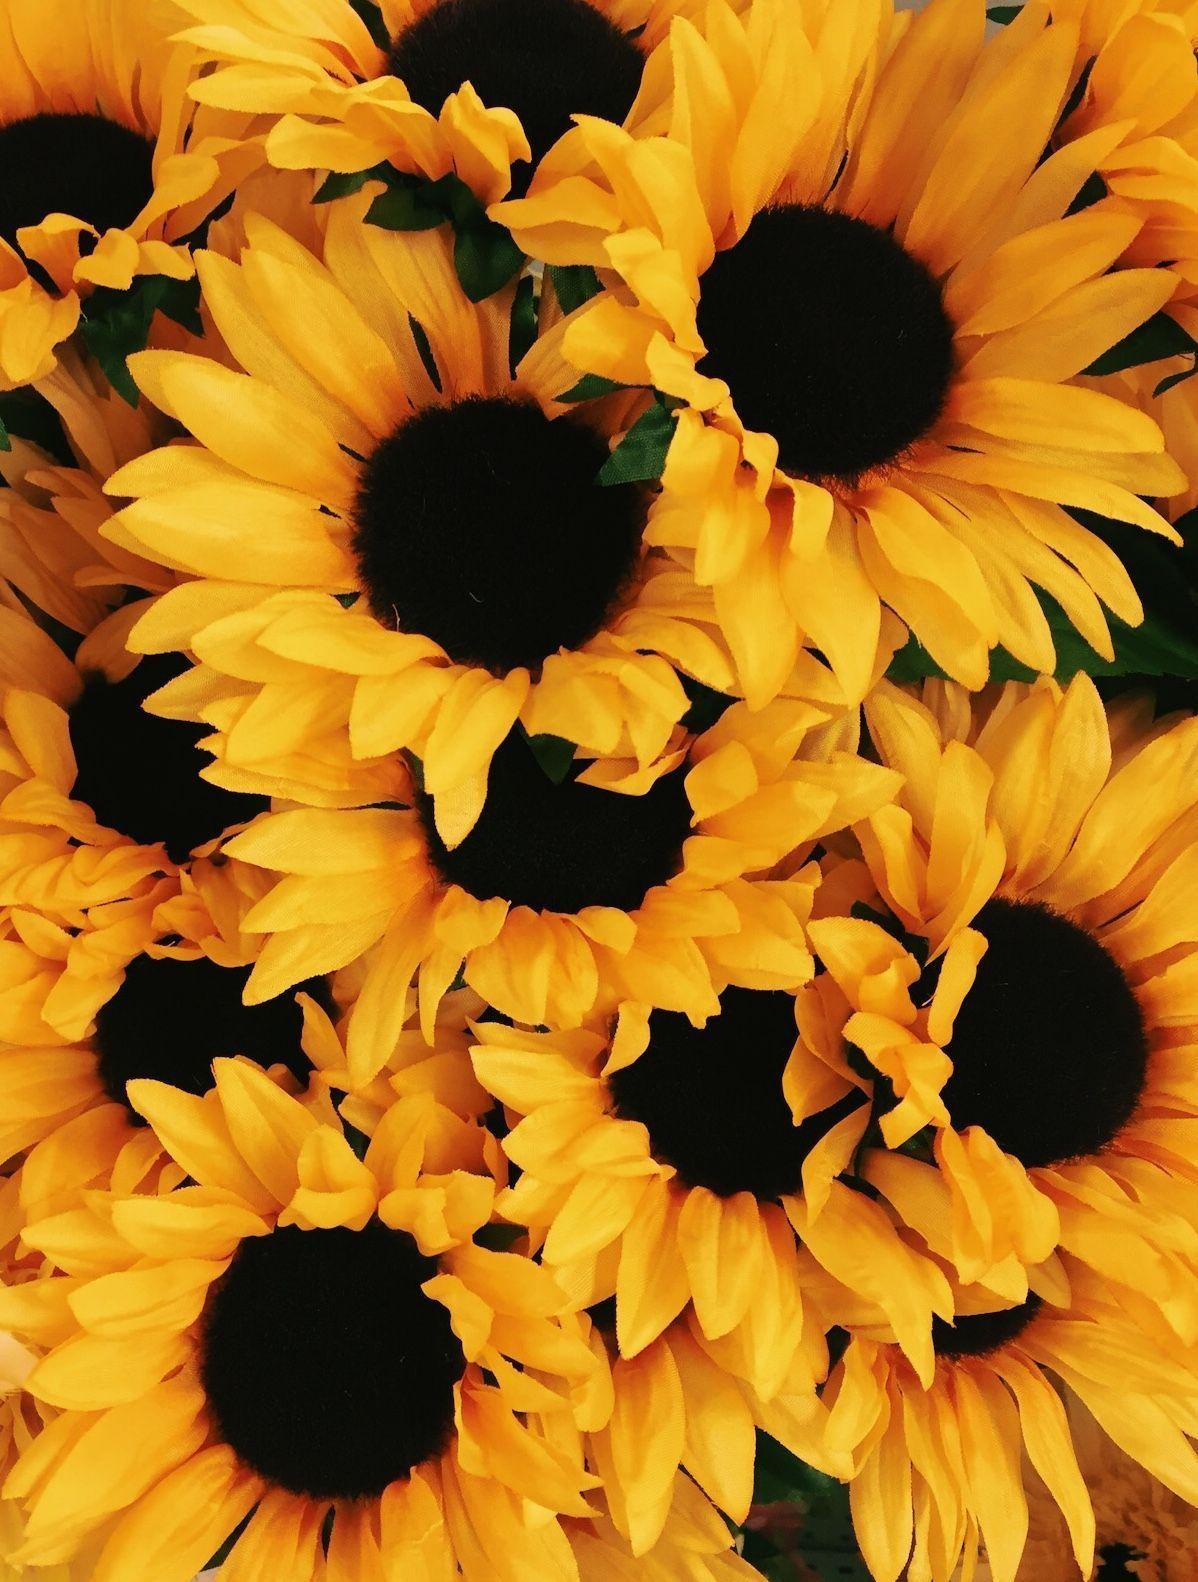 yellow aesthetics — sunshineyposts more of my photography